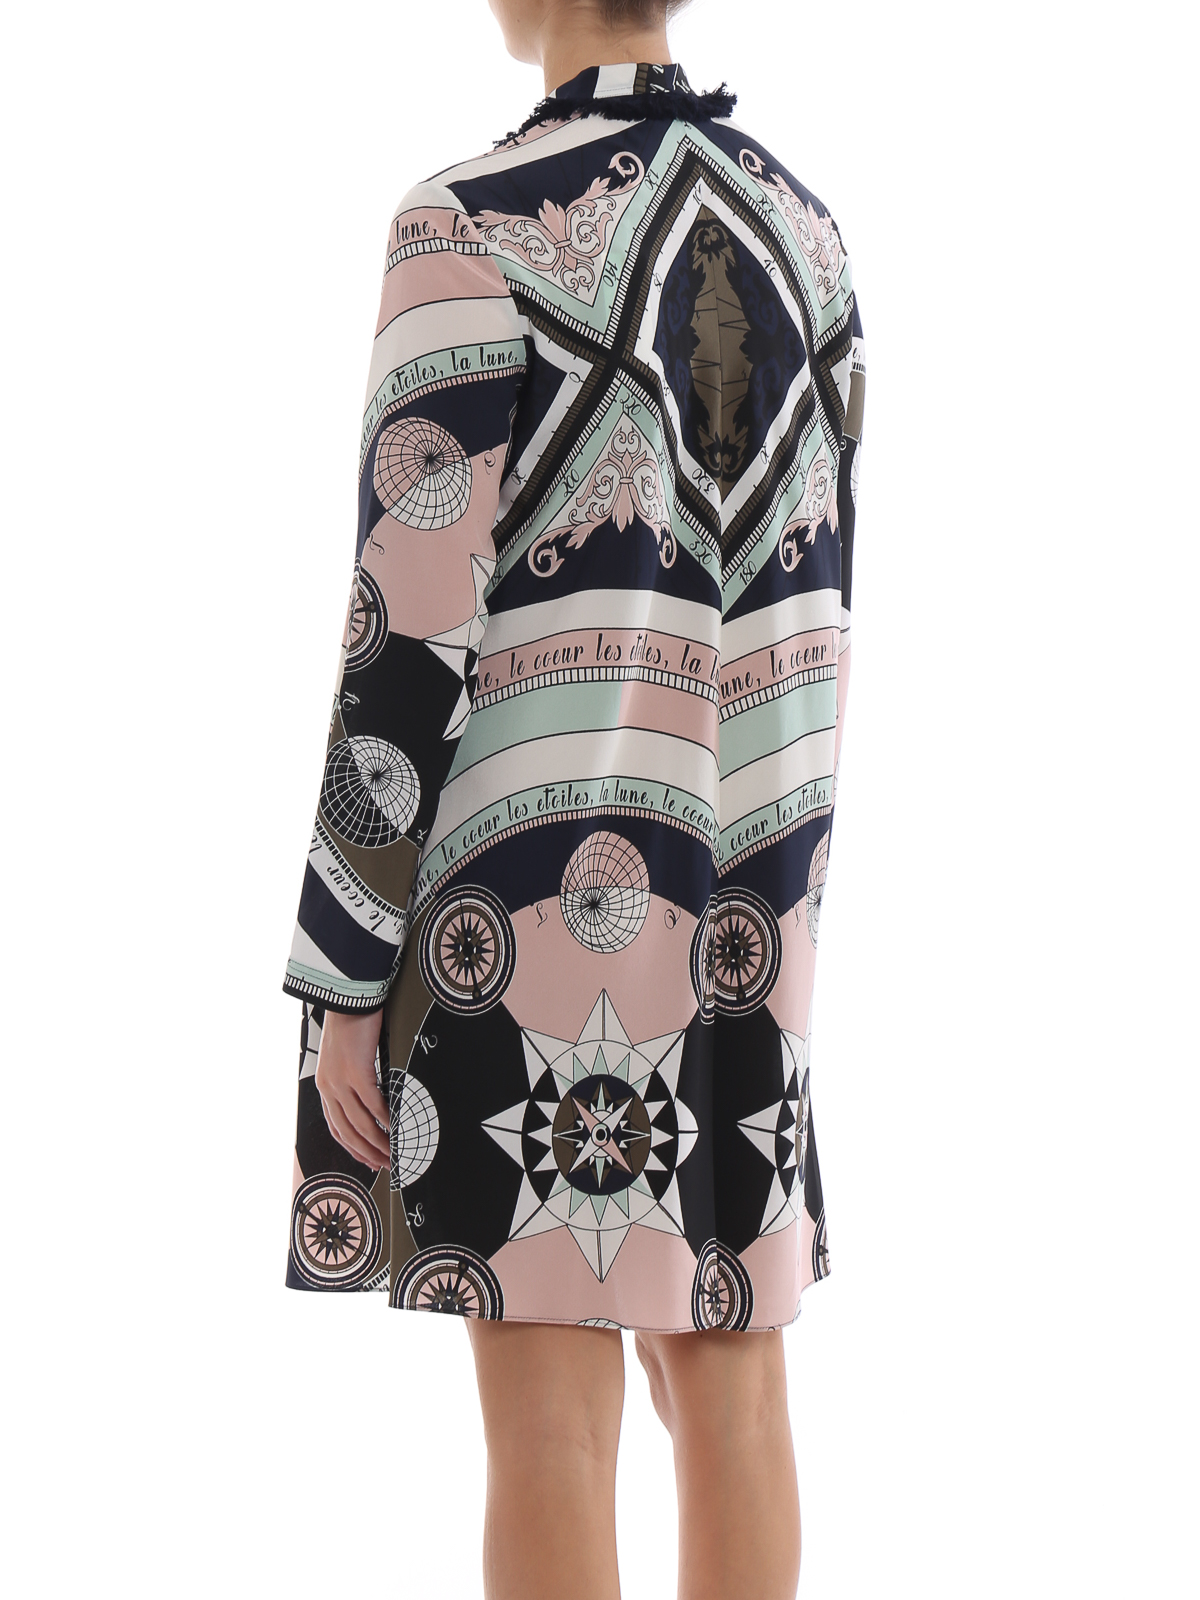 6b0006a920c77 Tory Burch - Fringe bow printed silk shirt dress - knee length ...